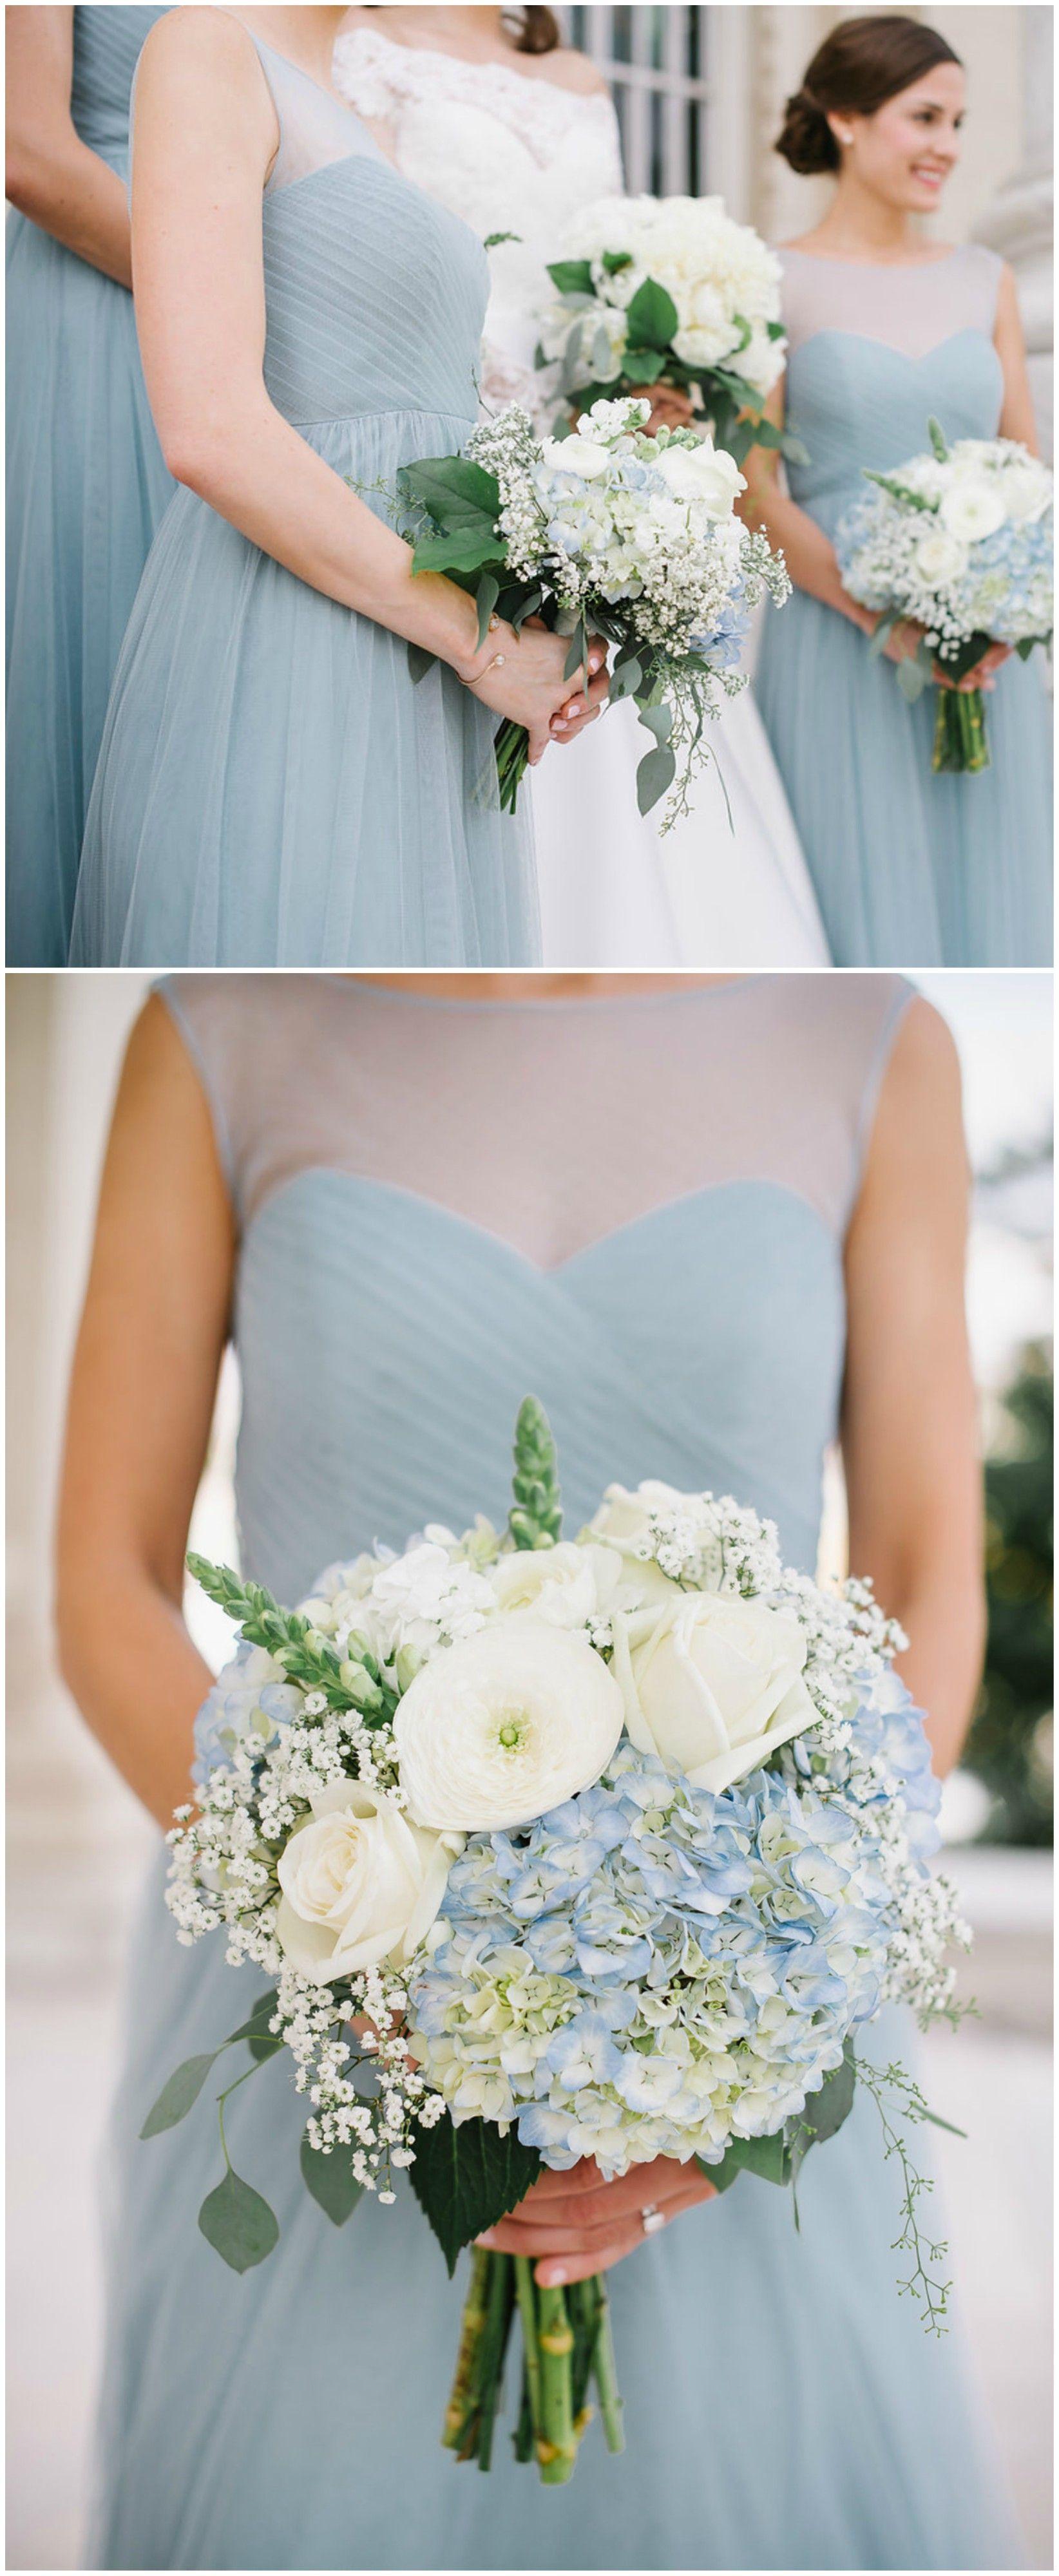 light perfect bridesmaid s dresses top us for women dress blue line shop lighting uk simple adorable baby